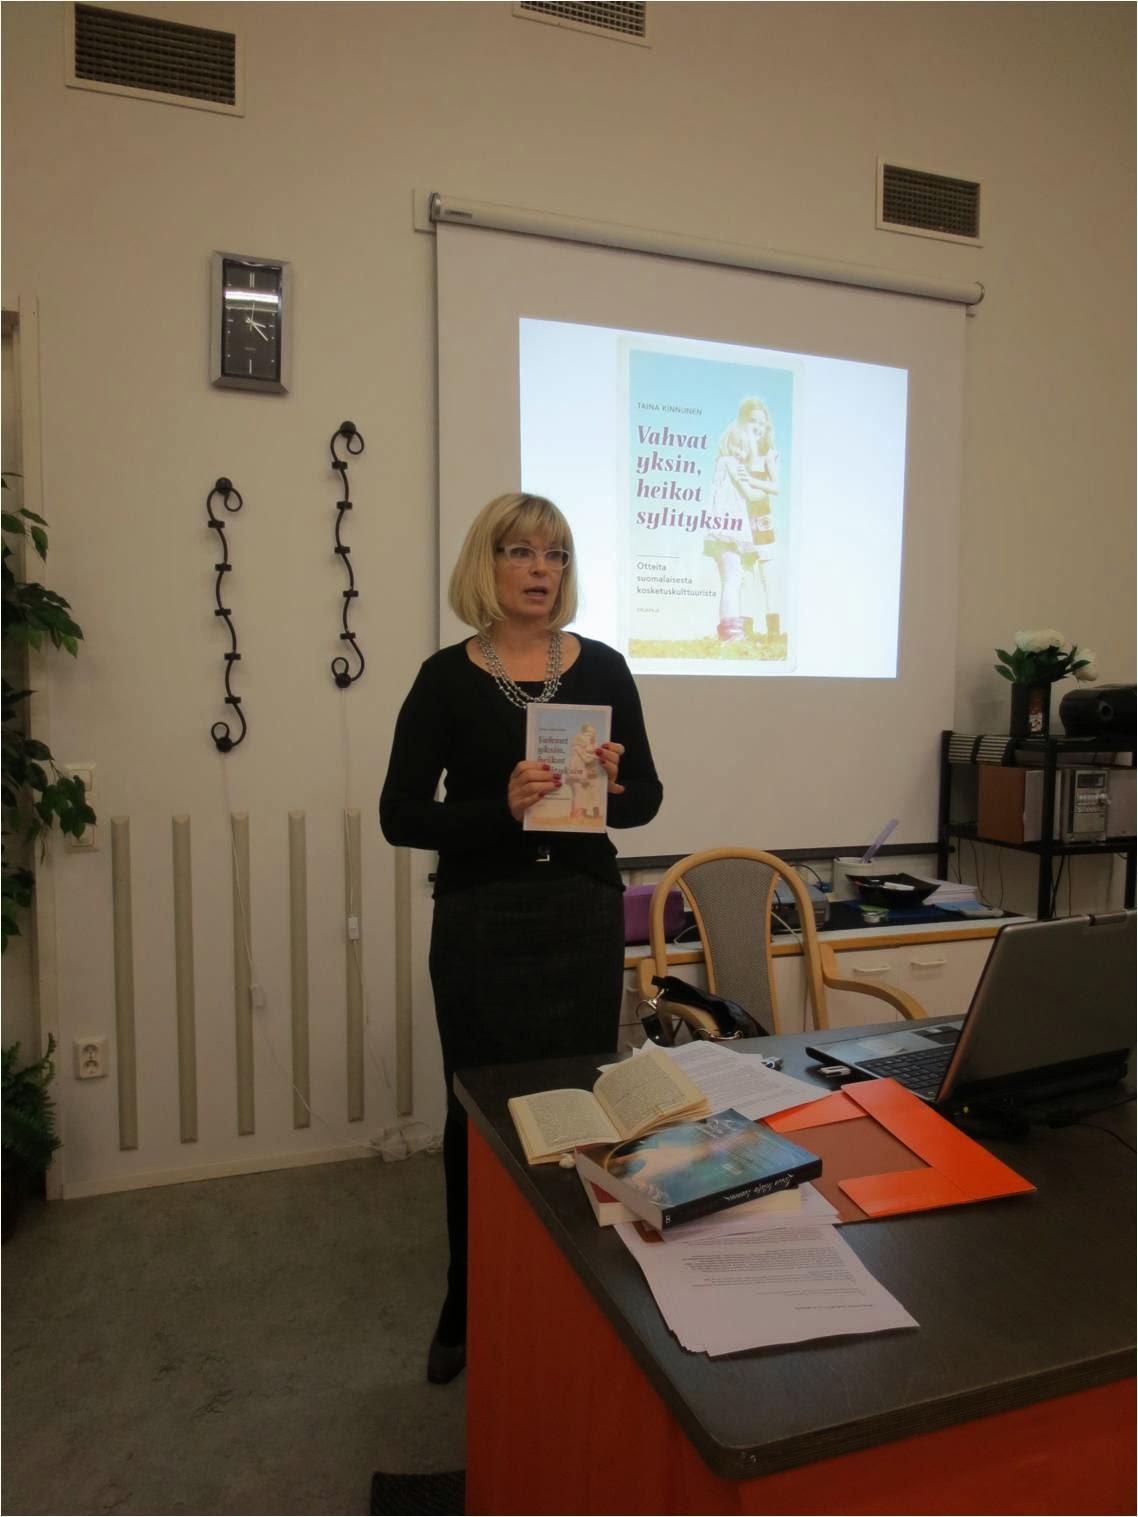 Taina Kinnunen